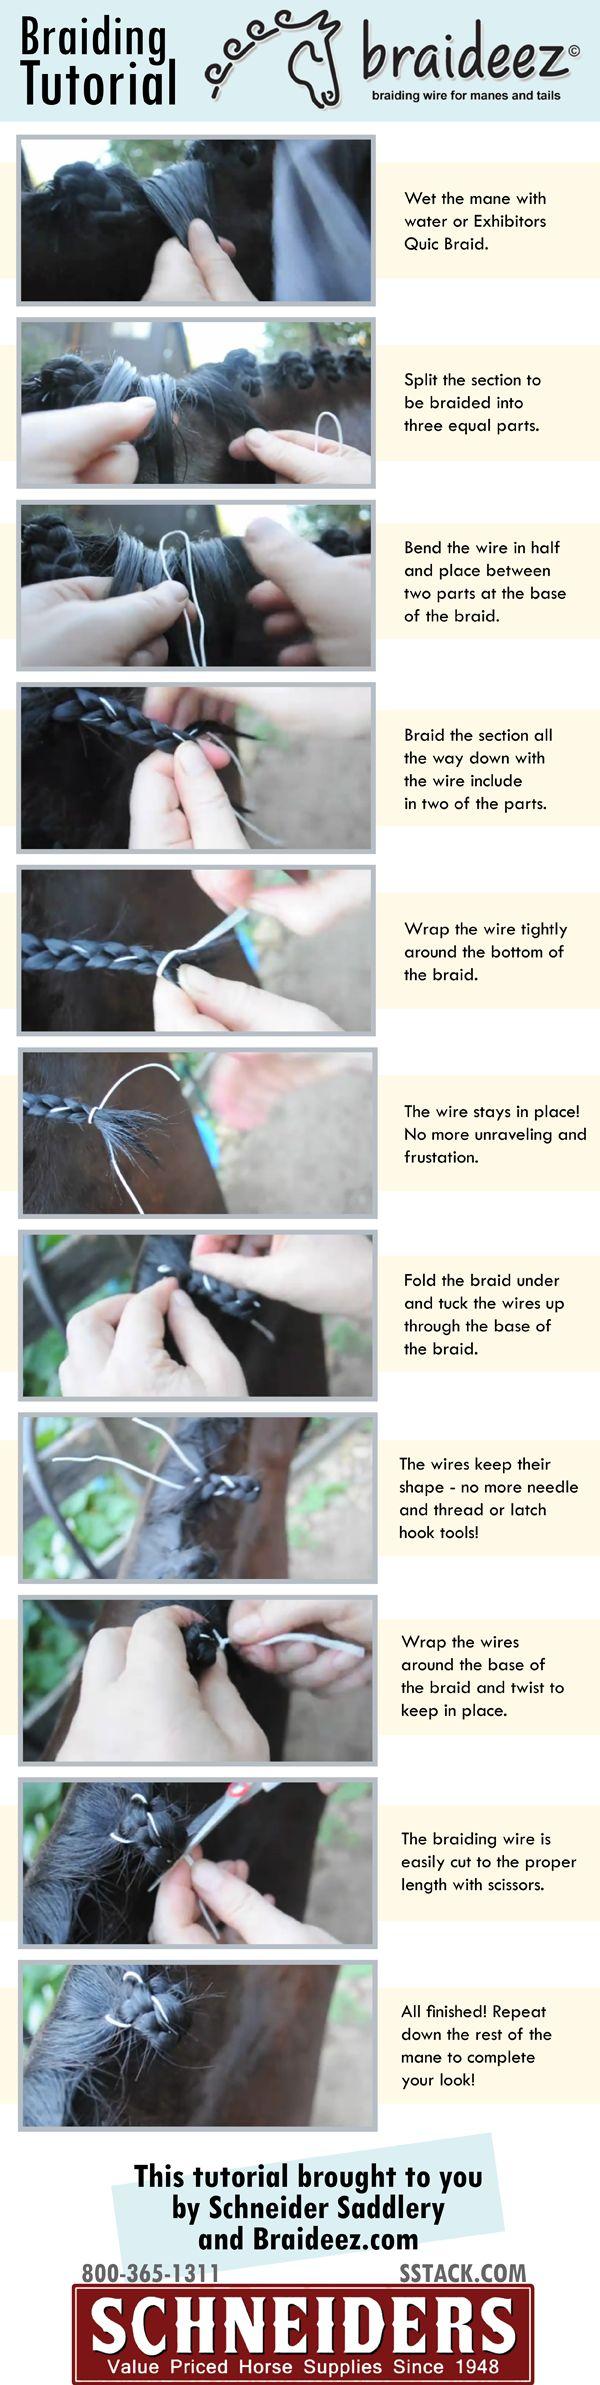 Braideez Tutorial. Horse braiding made simple. By Schneiders Saddlery